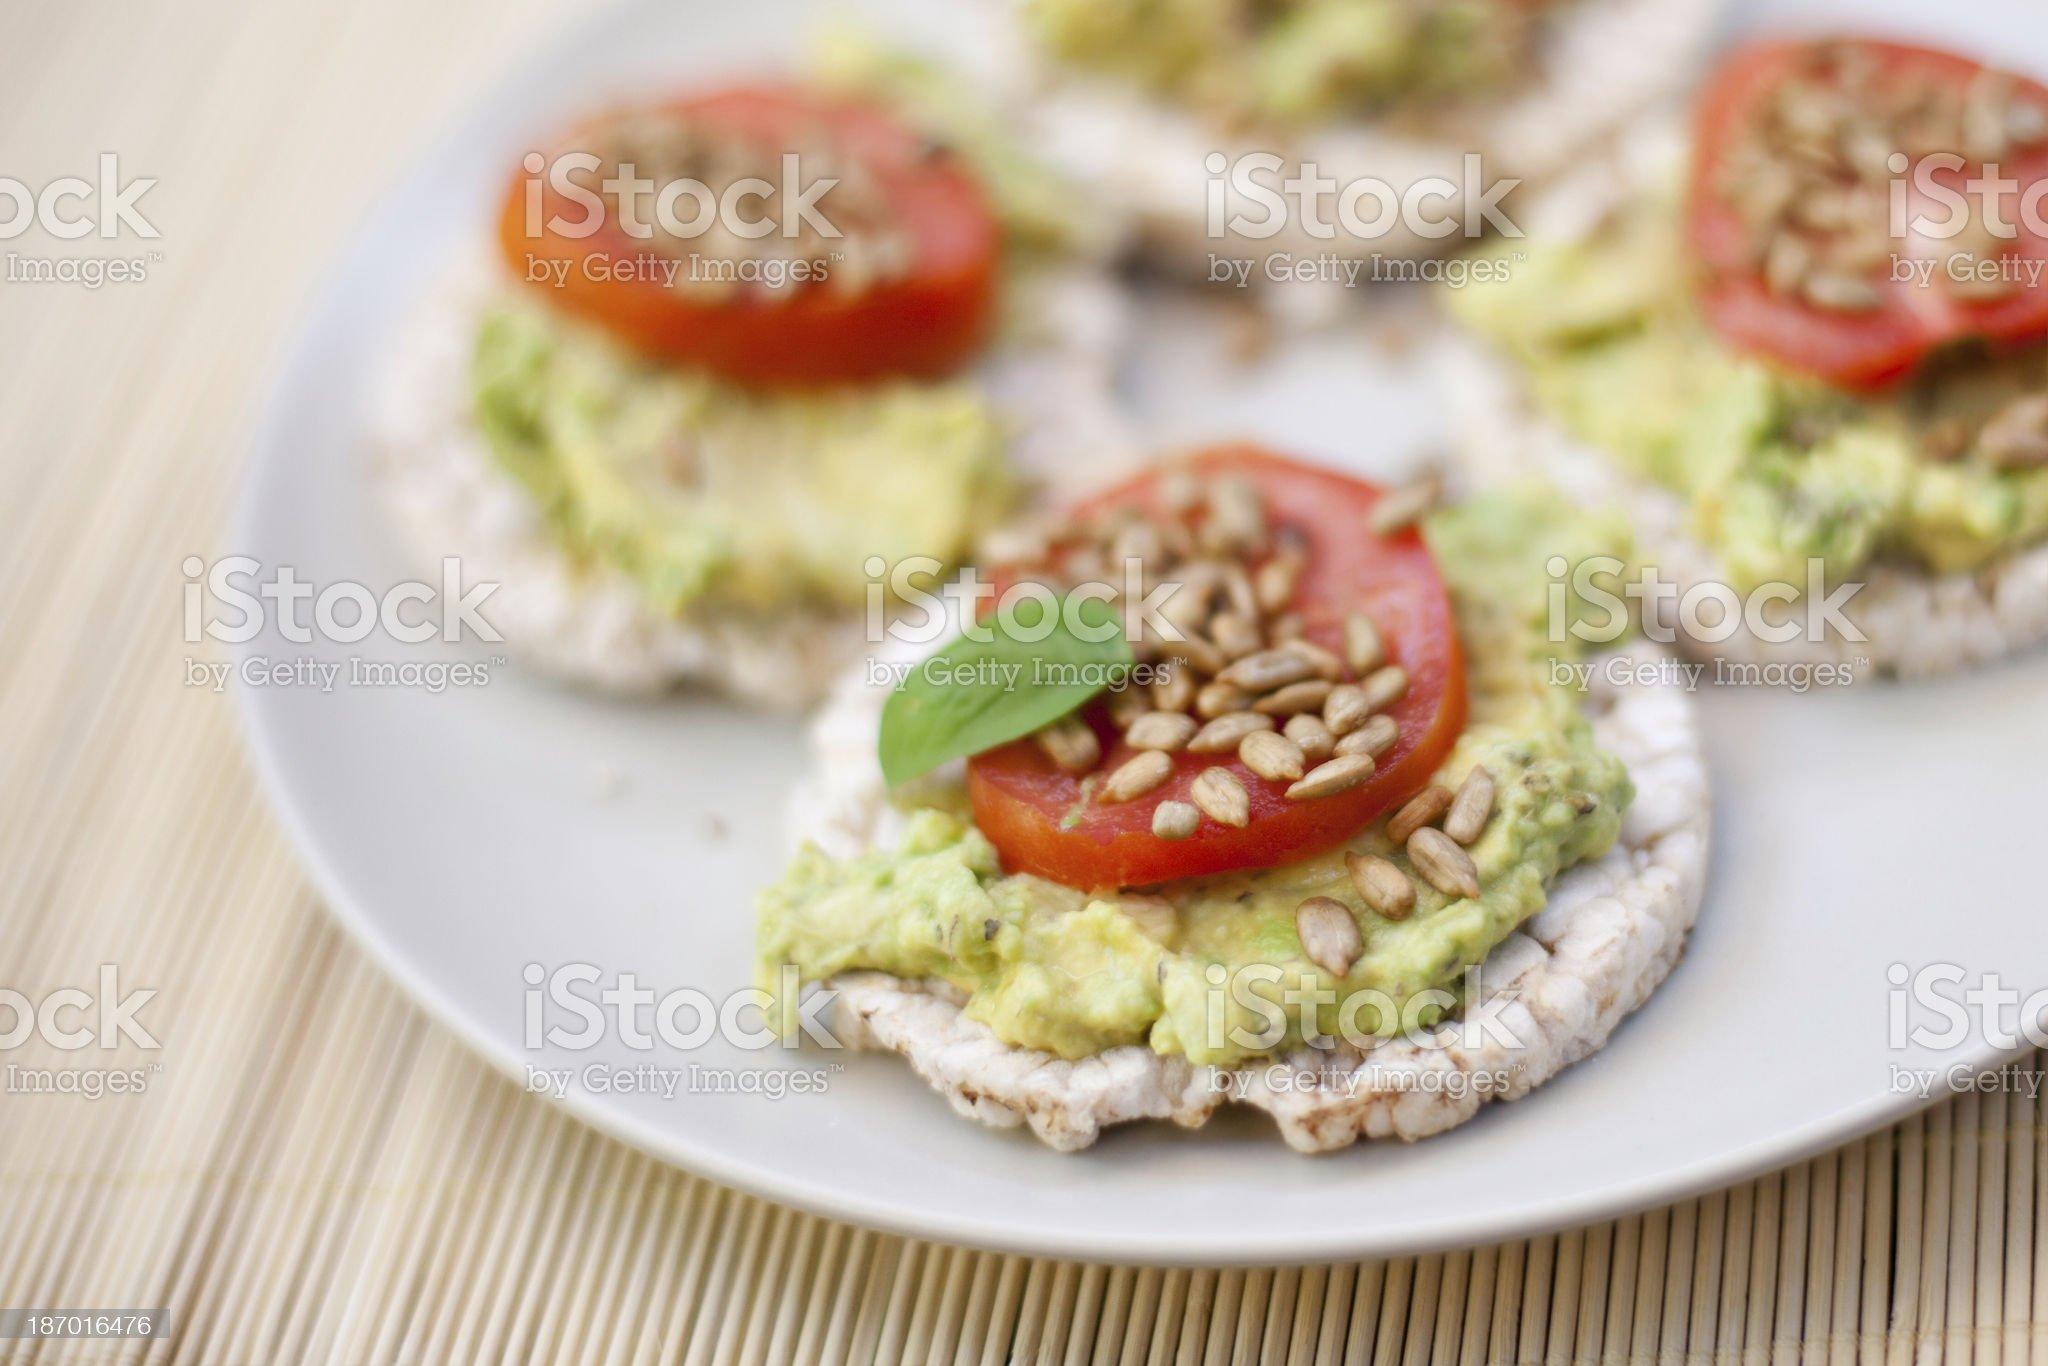 Avocado Snack royalty-free stock photo